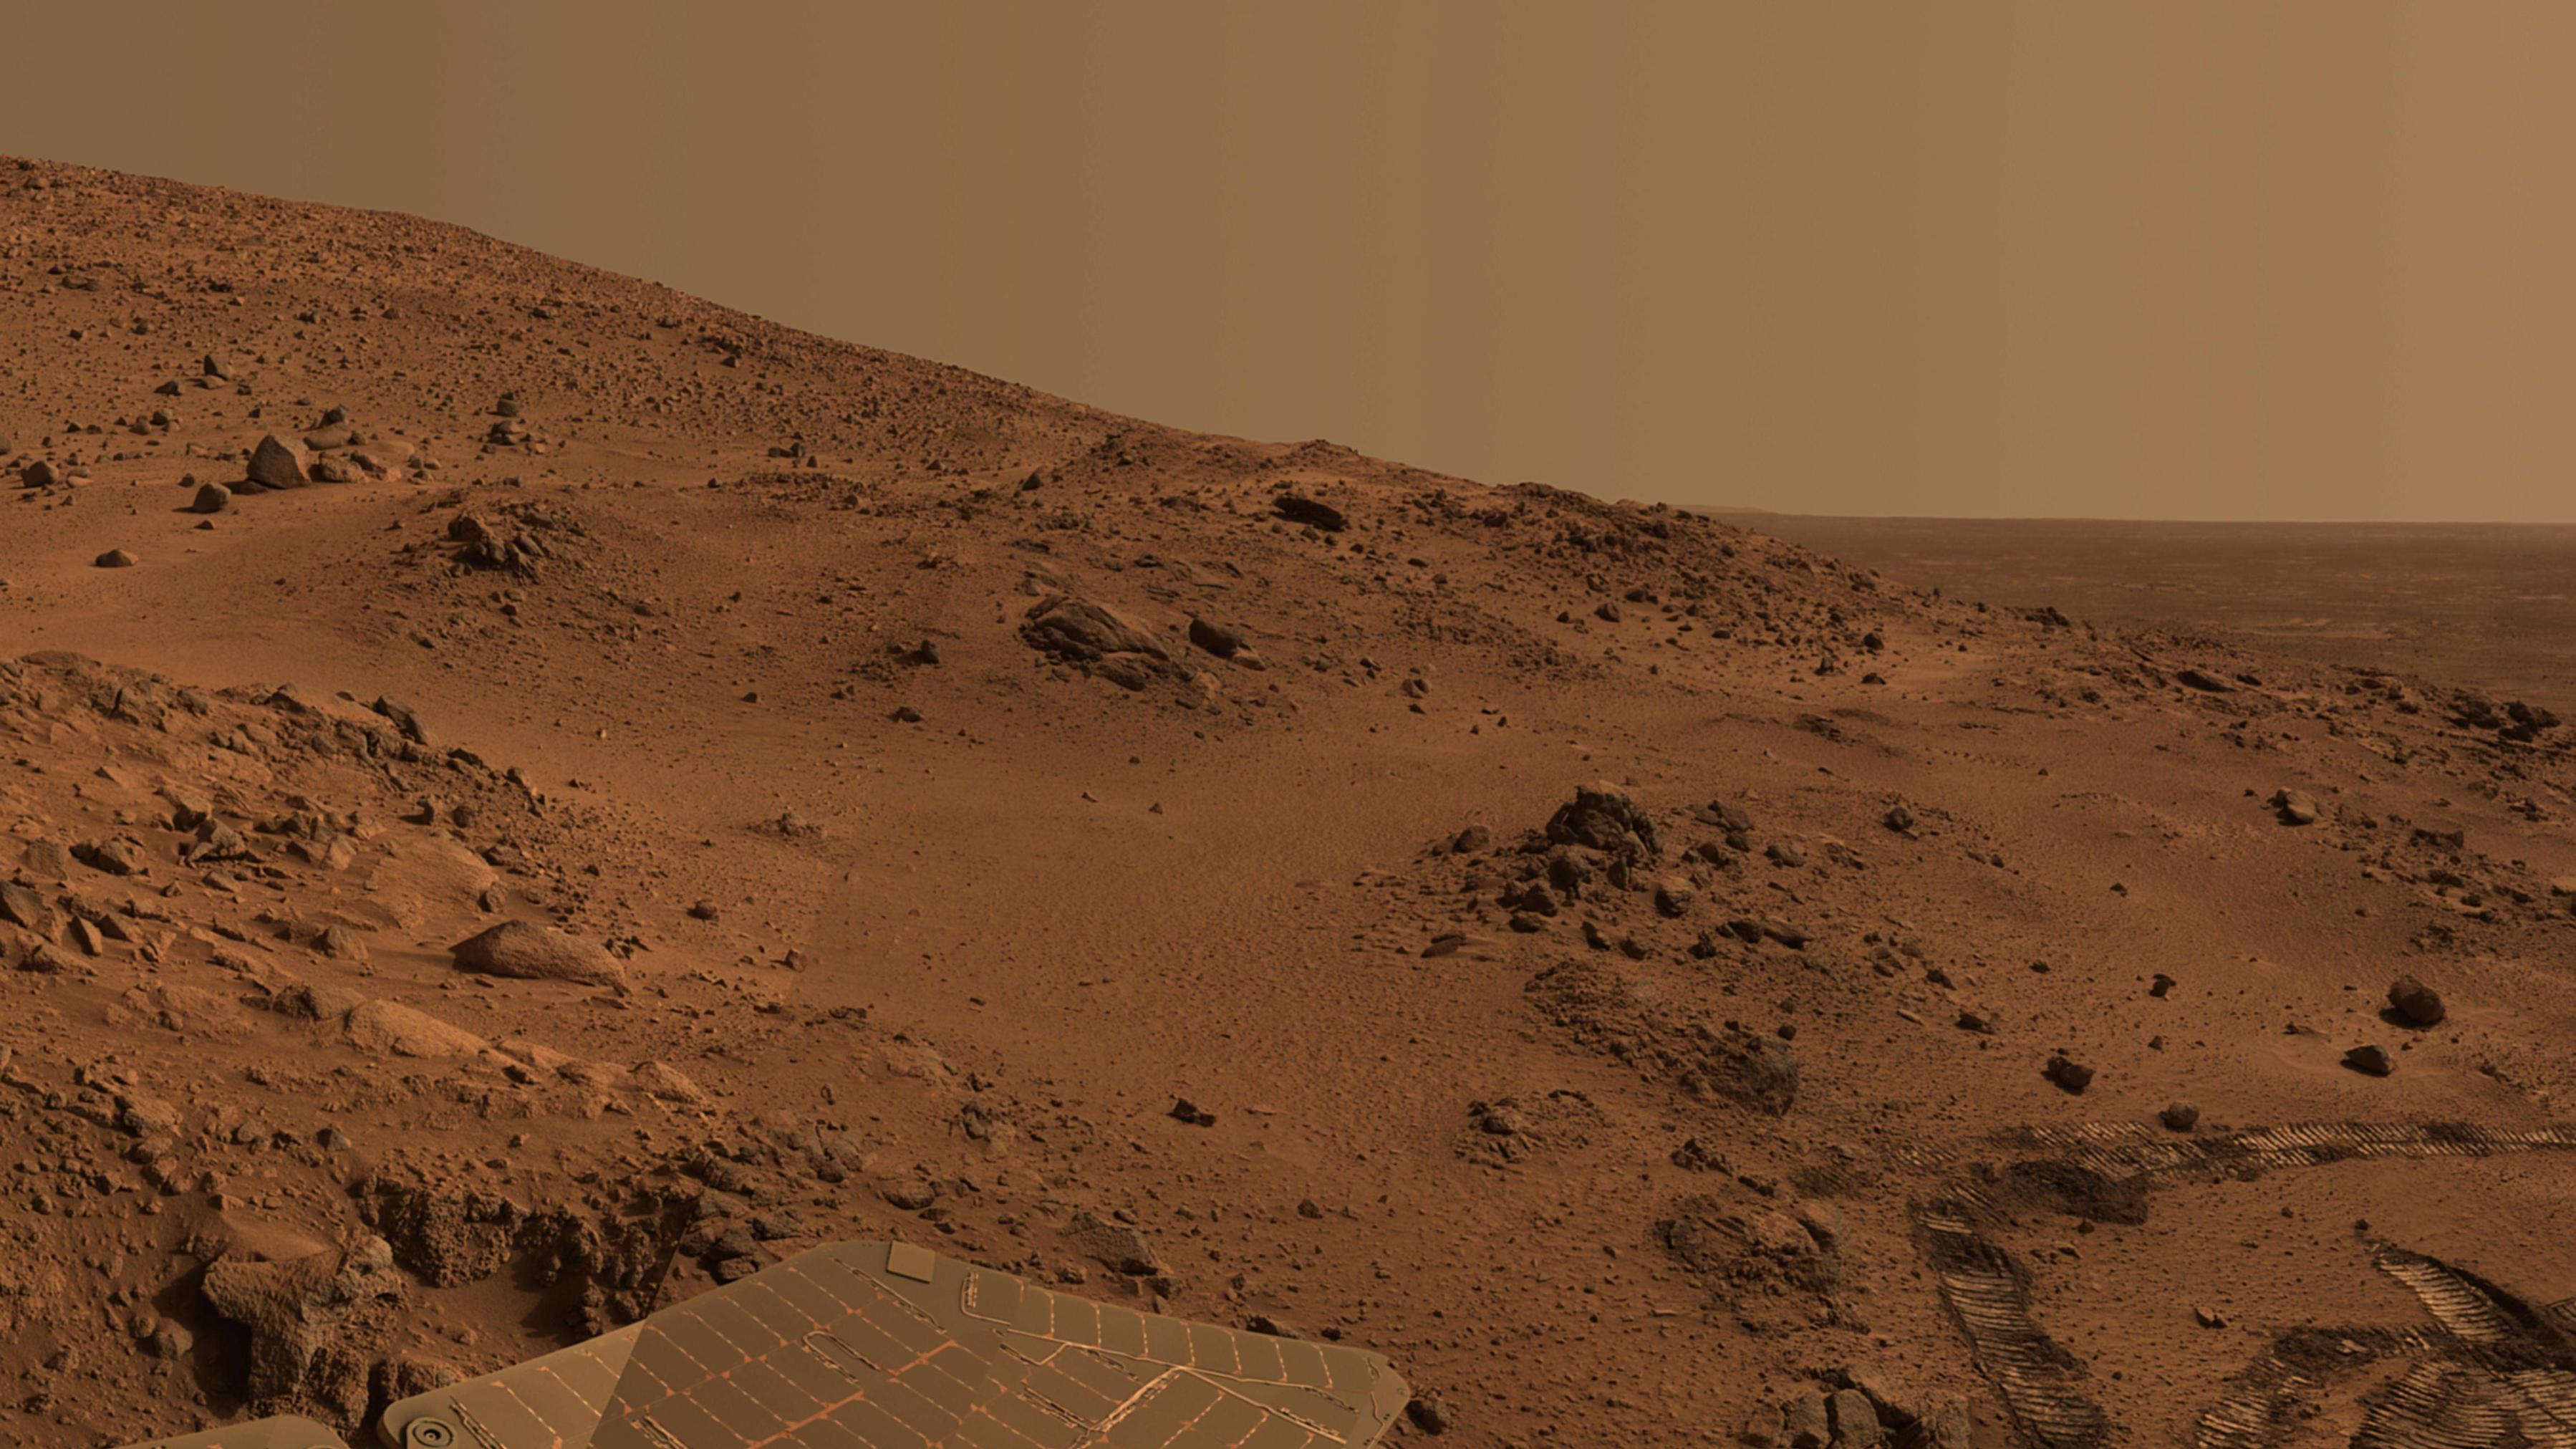 mars landscape images - HD3597×2023